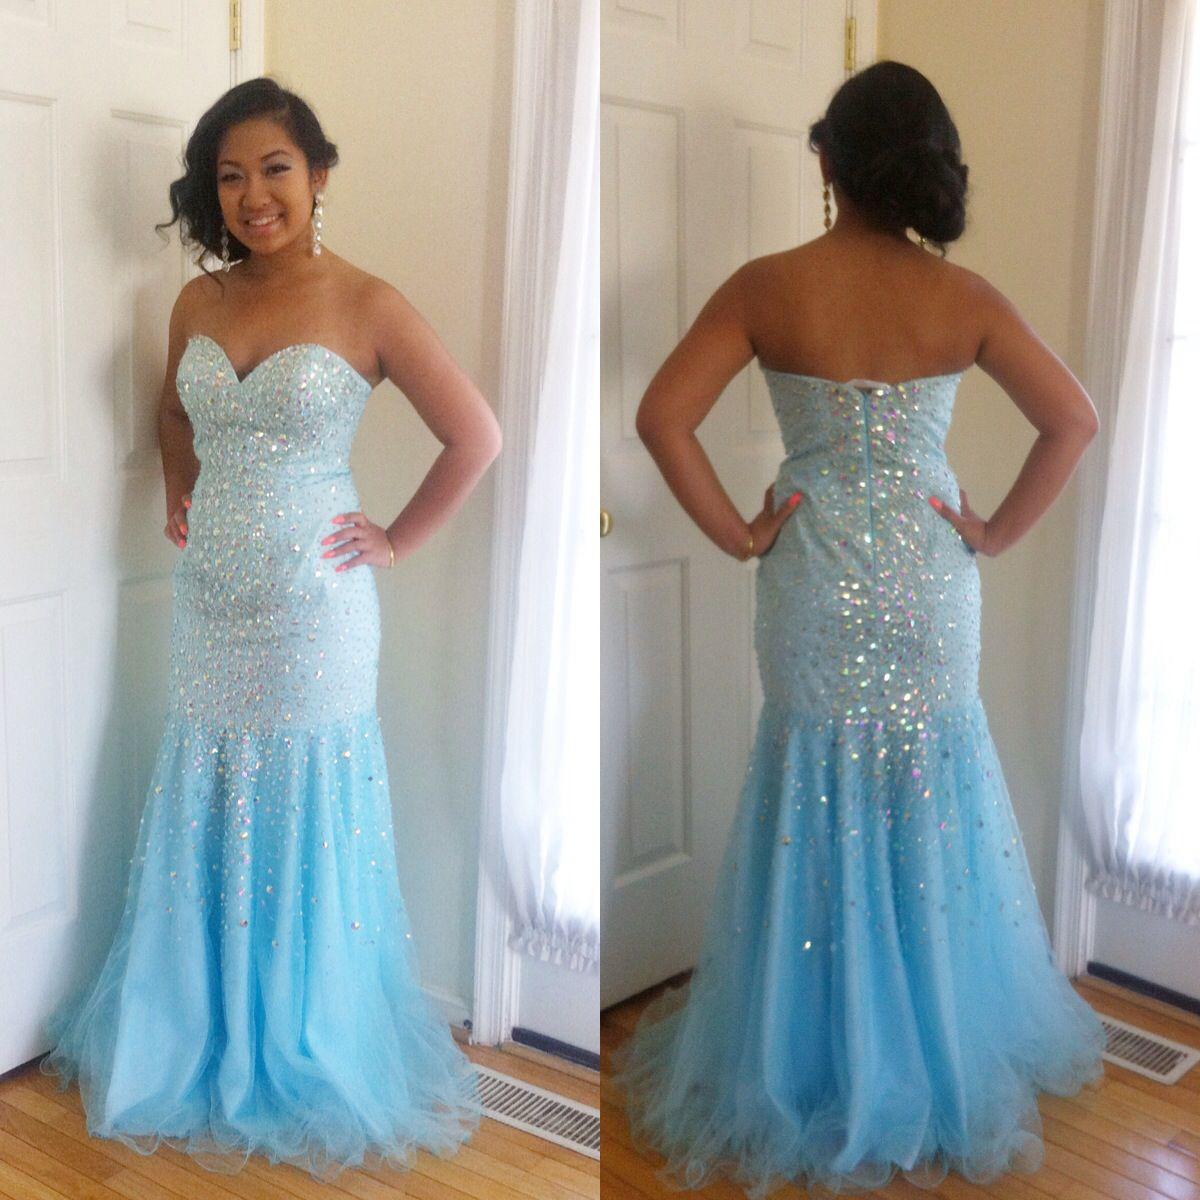 Aqua mermaid Terani prom dress 2014 and side bun updo hairstyle ...